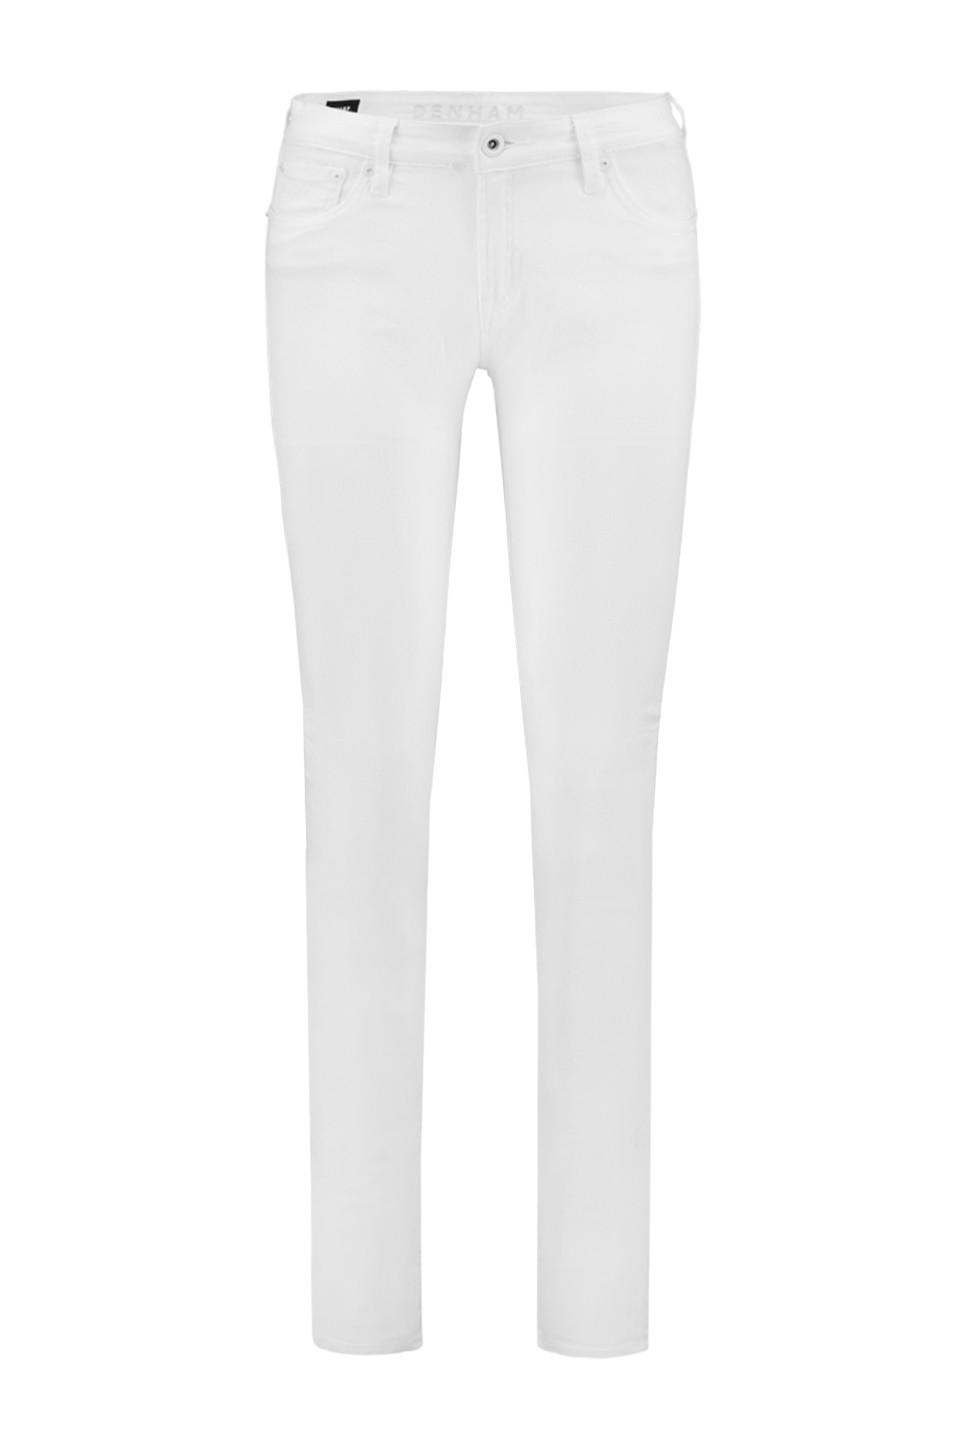 Denham Sharp SWS Dames Jeans in Wit